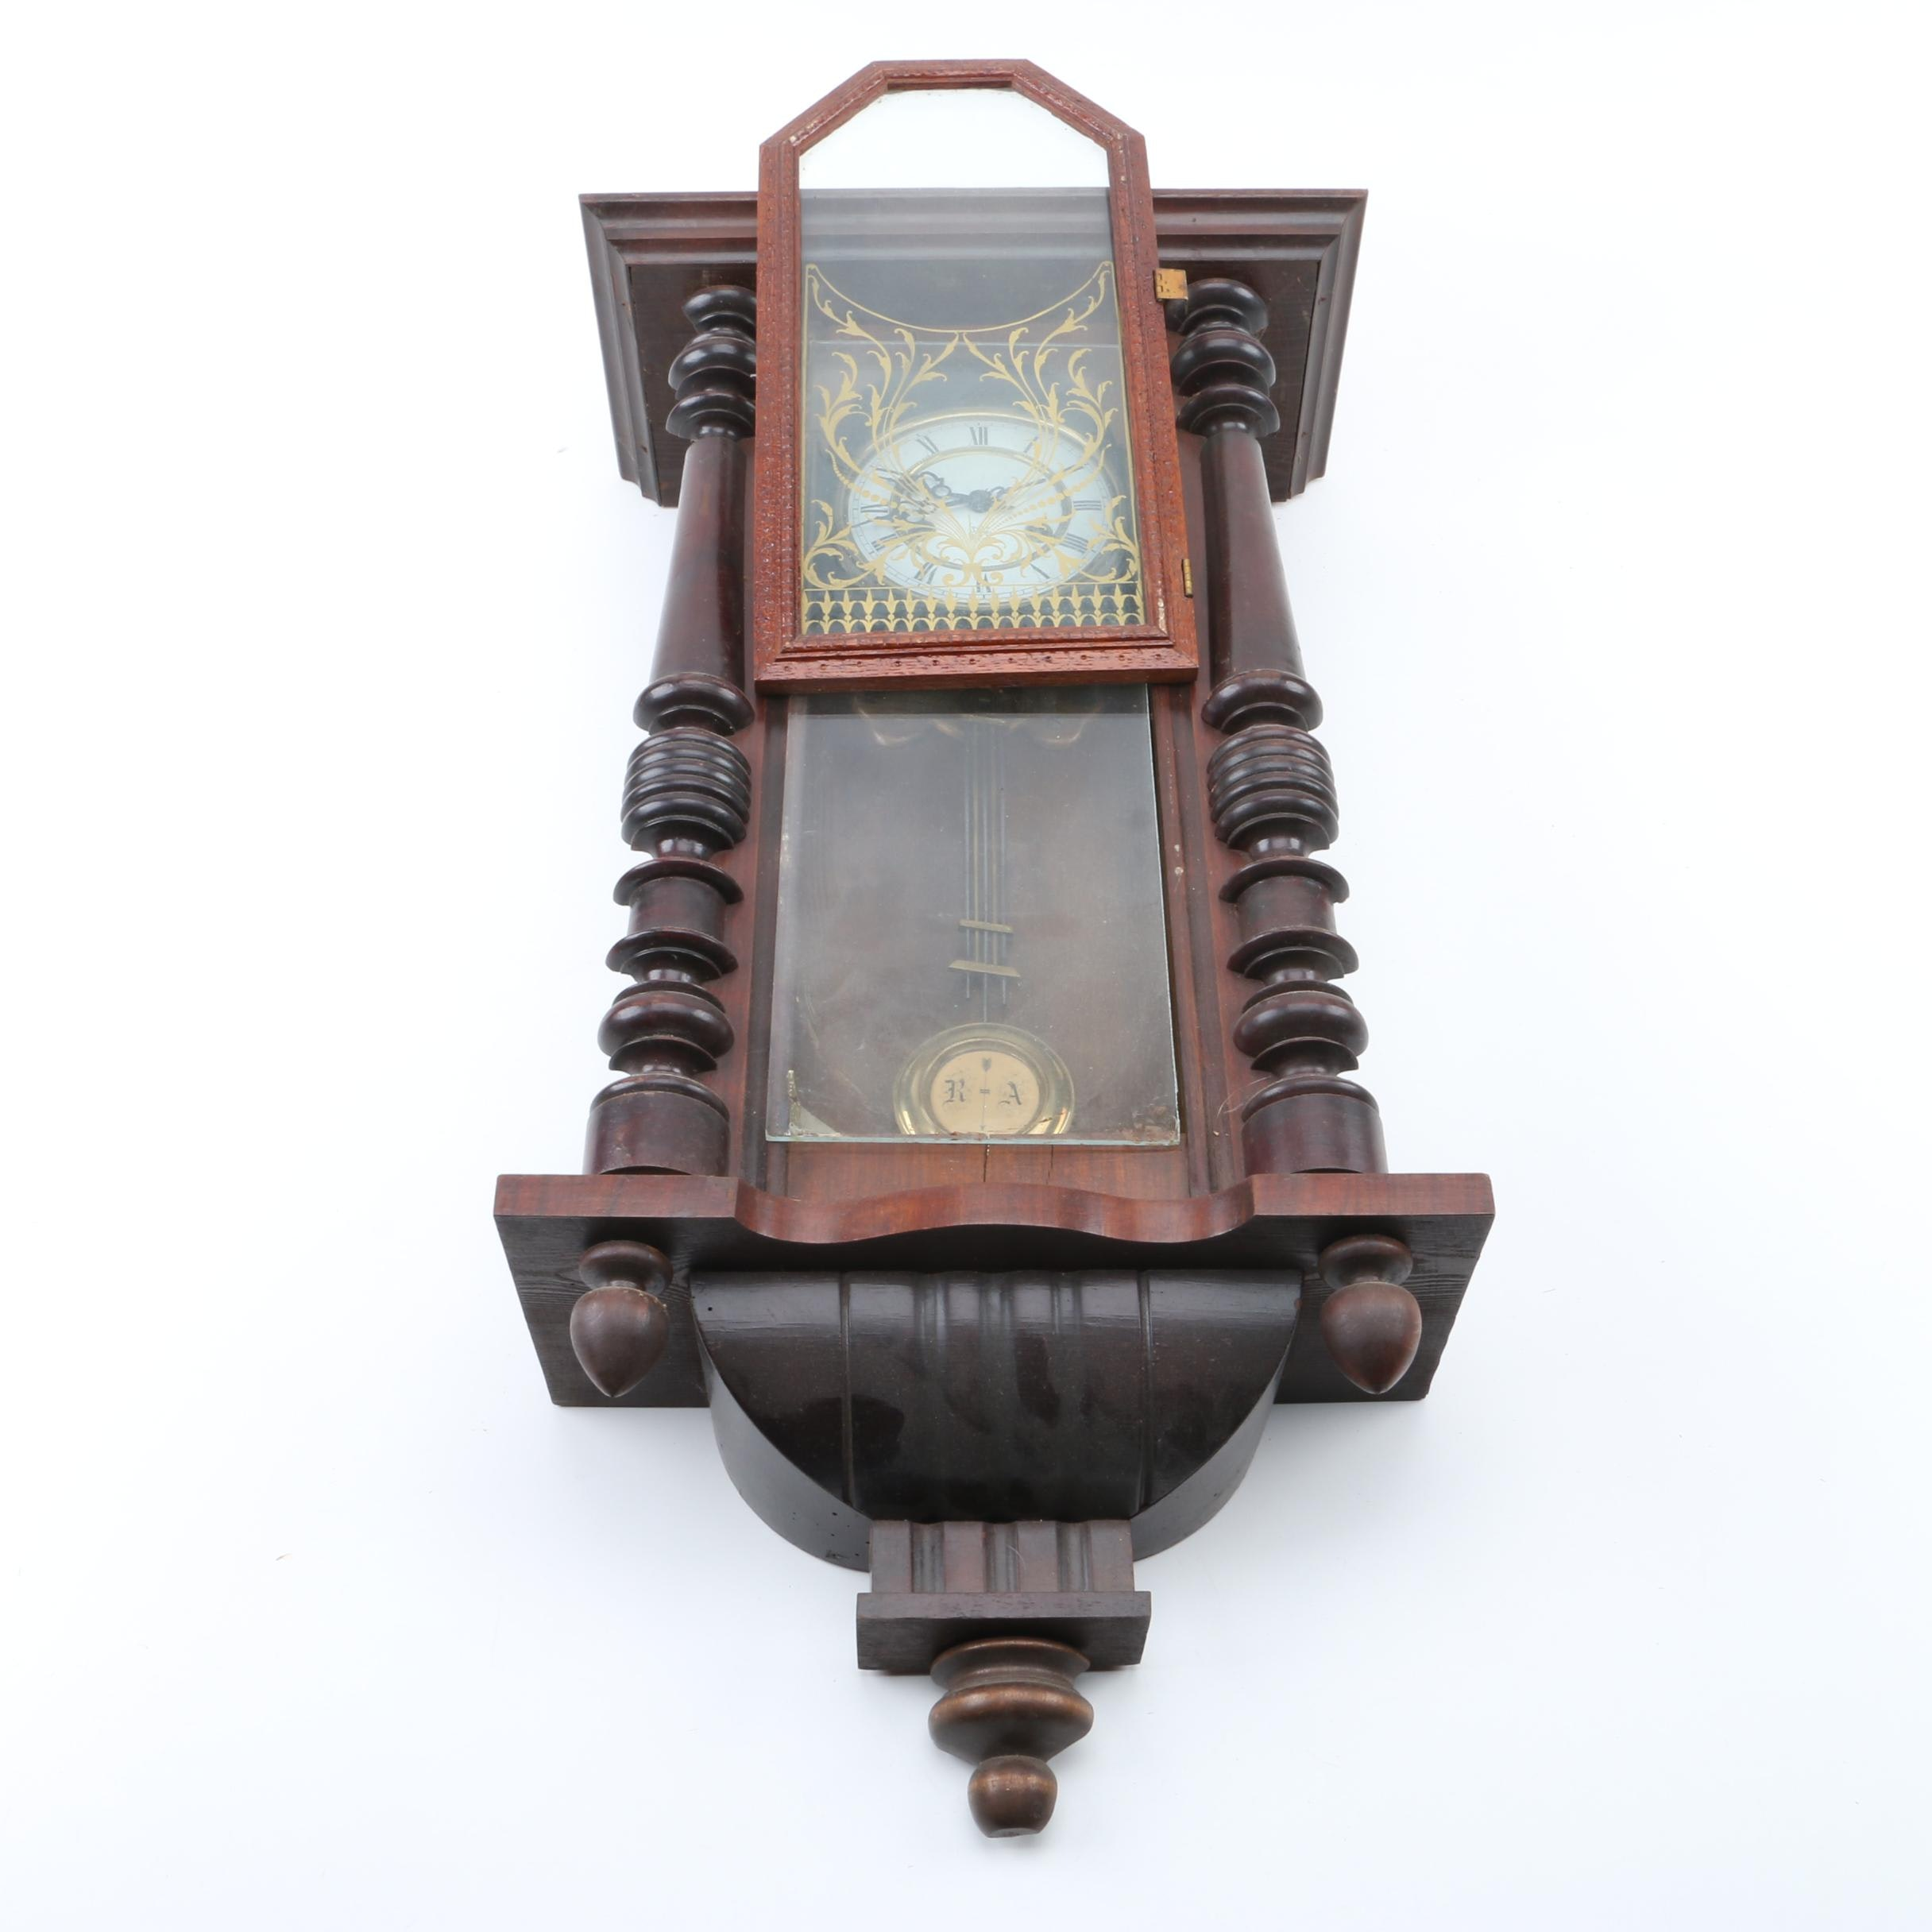 Junghans Wooden Vienna Style Regulator  Wall Clock